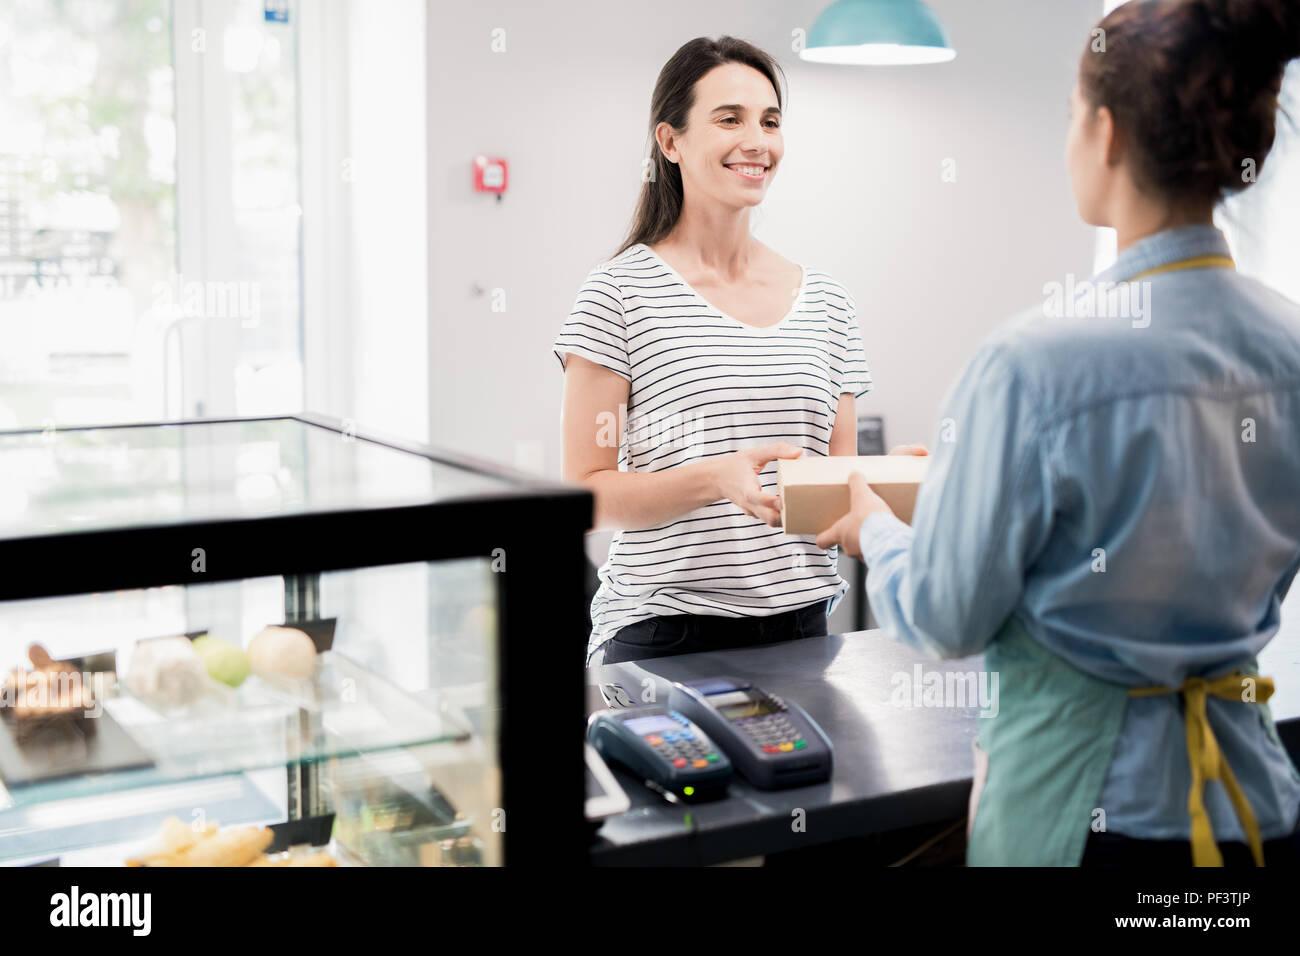 Satisfied Customer in Cake Shop - Stock Image